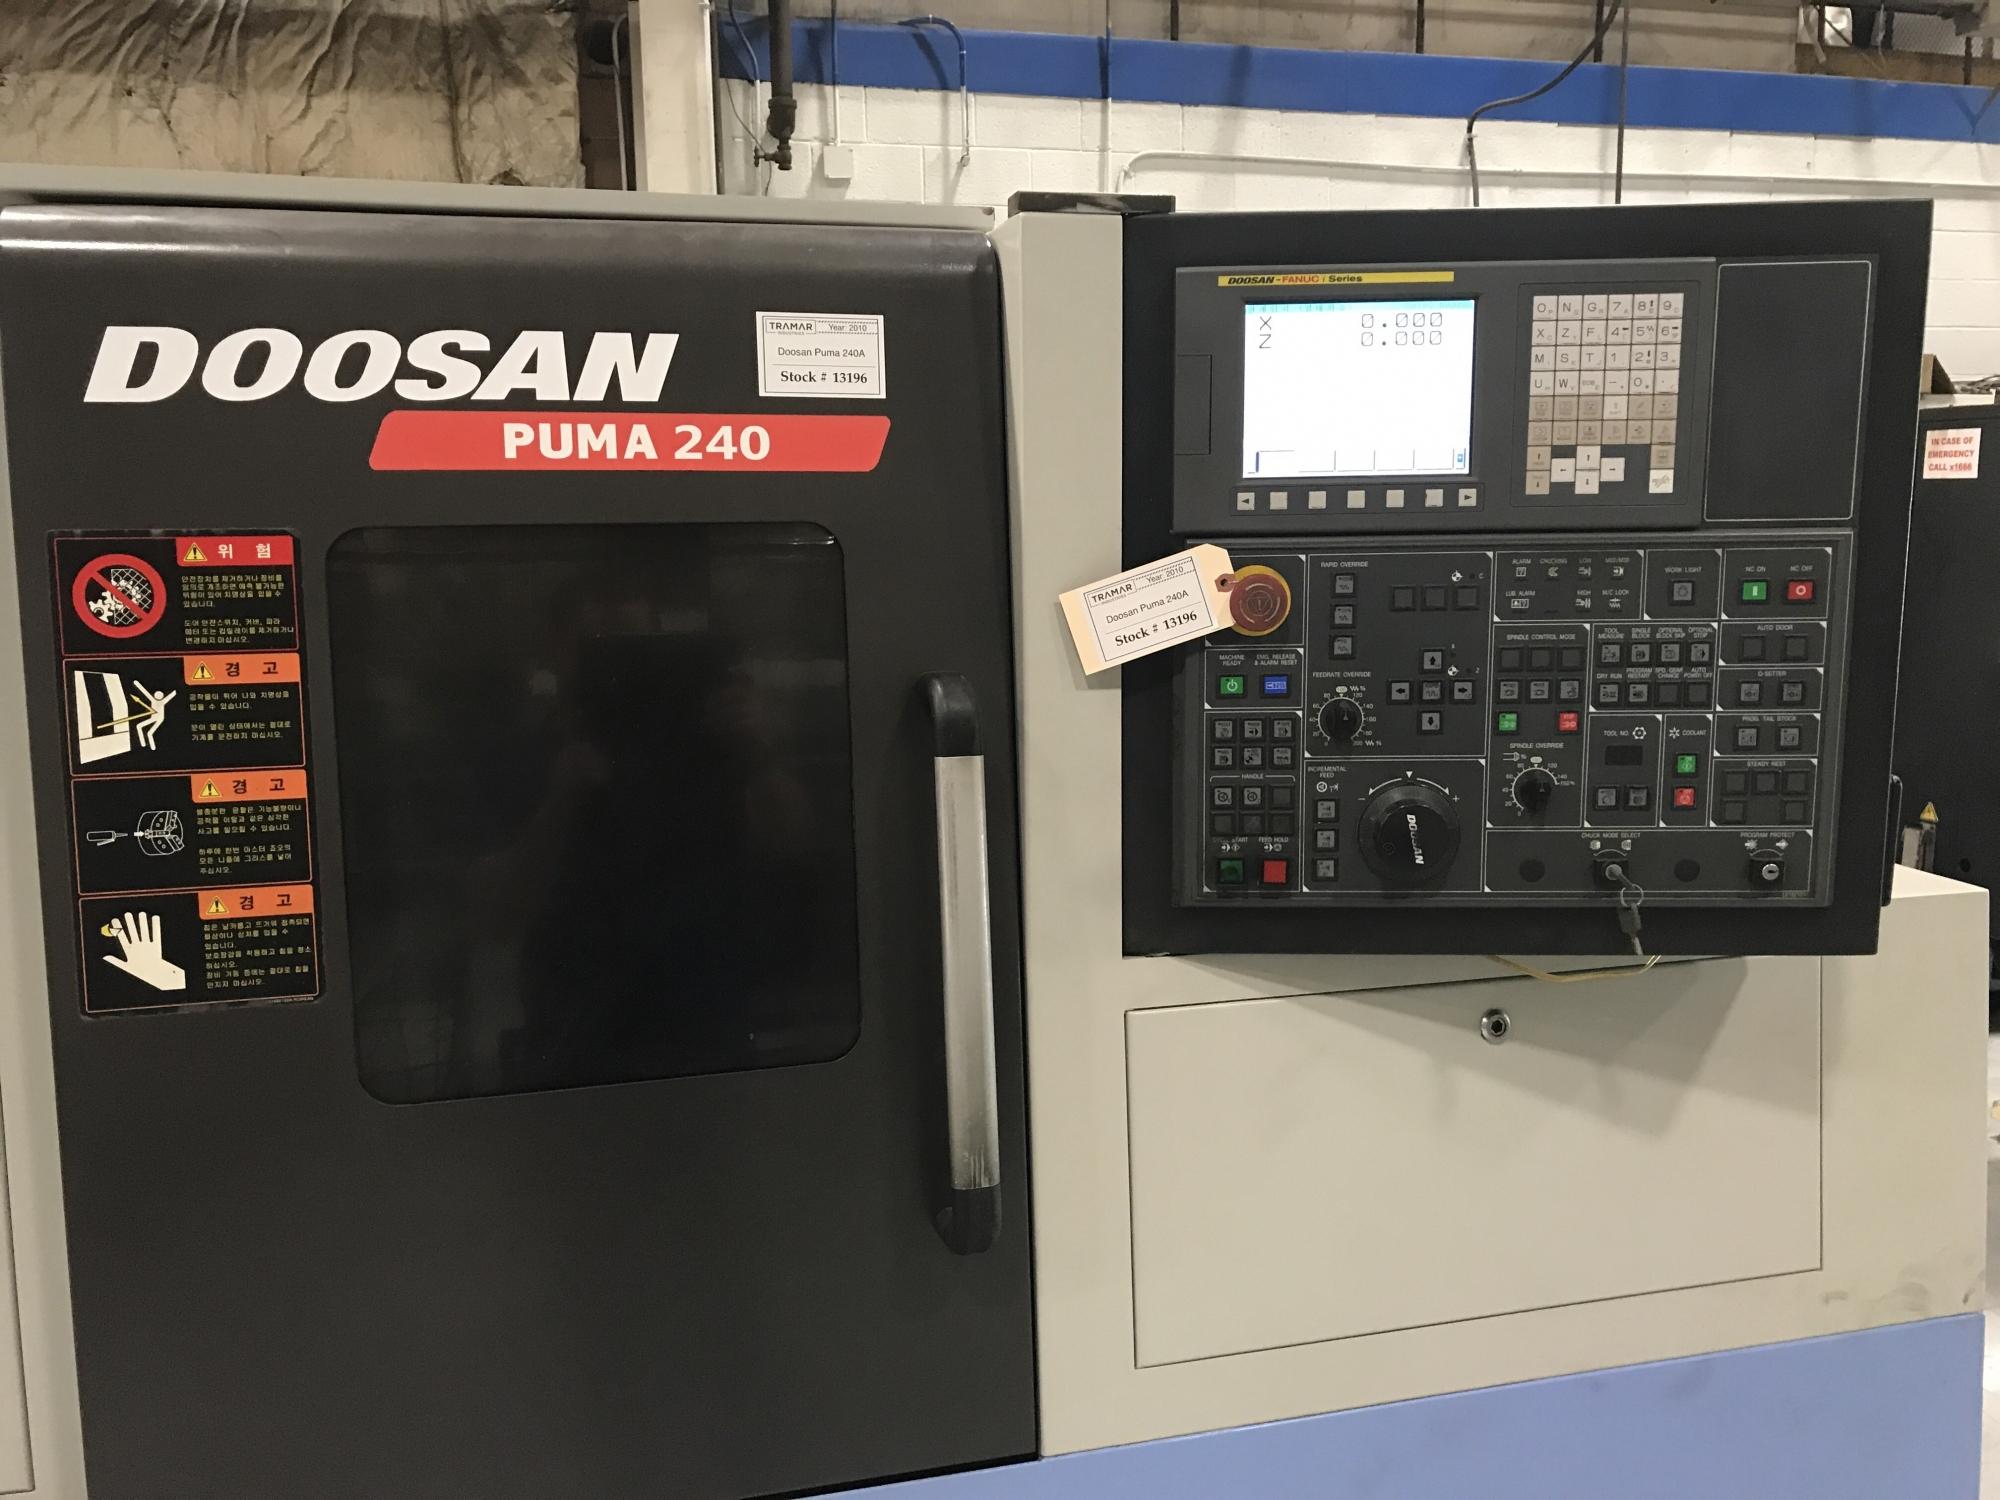 2010 Doosan Puma 240A - CNC Horizontal Lathe